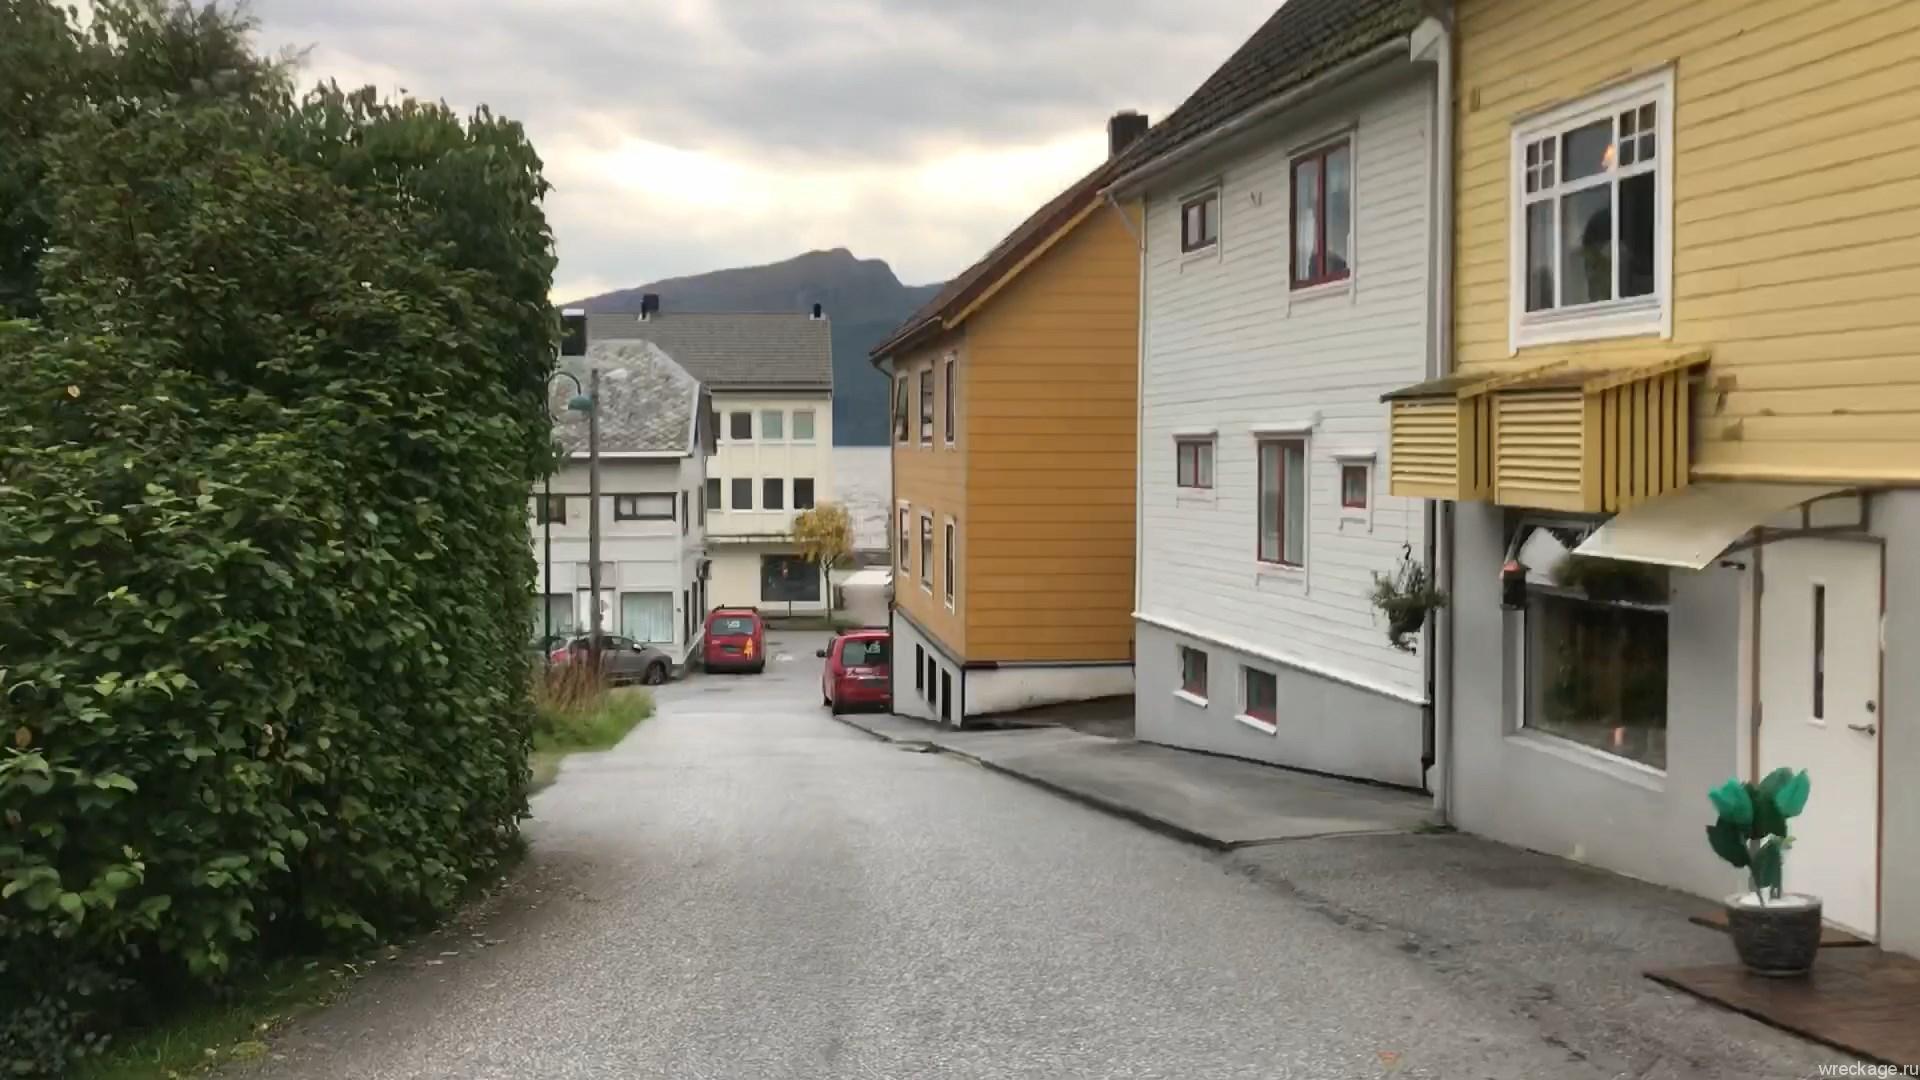 Город Volda Норвегия